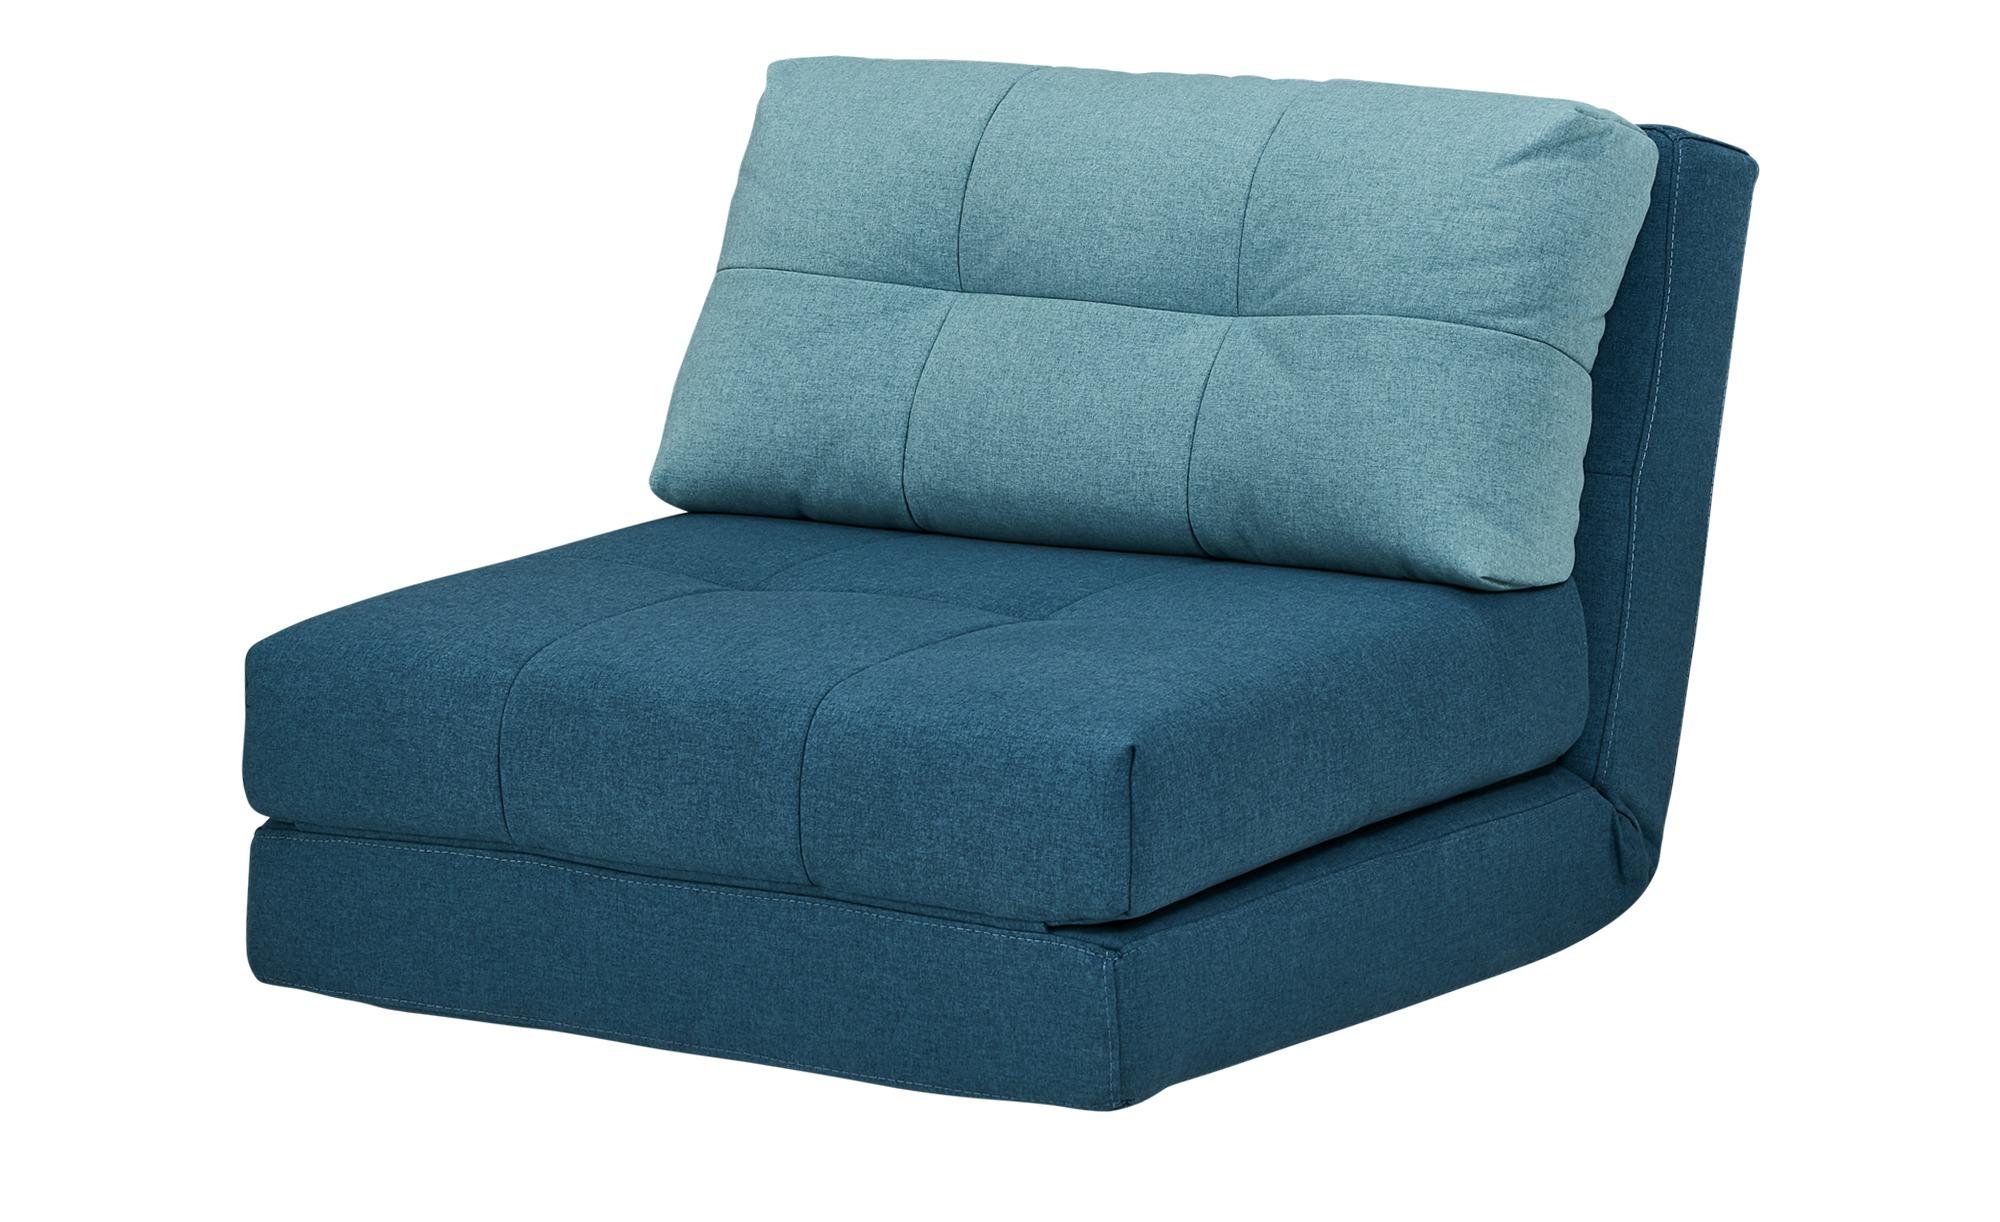 Schlafsessel - türkis/petrol - 90 cm - 72 cm - 80 cm - Polstermöbel > Sessel > Polstersessel - Möbel Kraft | Schlafzimmer > Schlafsofas > Schlafsessel | Sconto